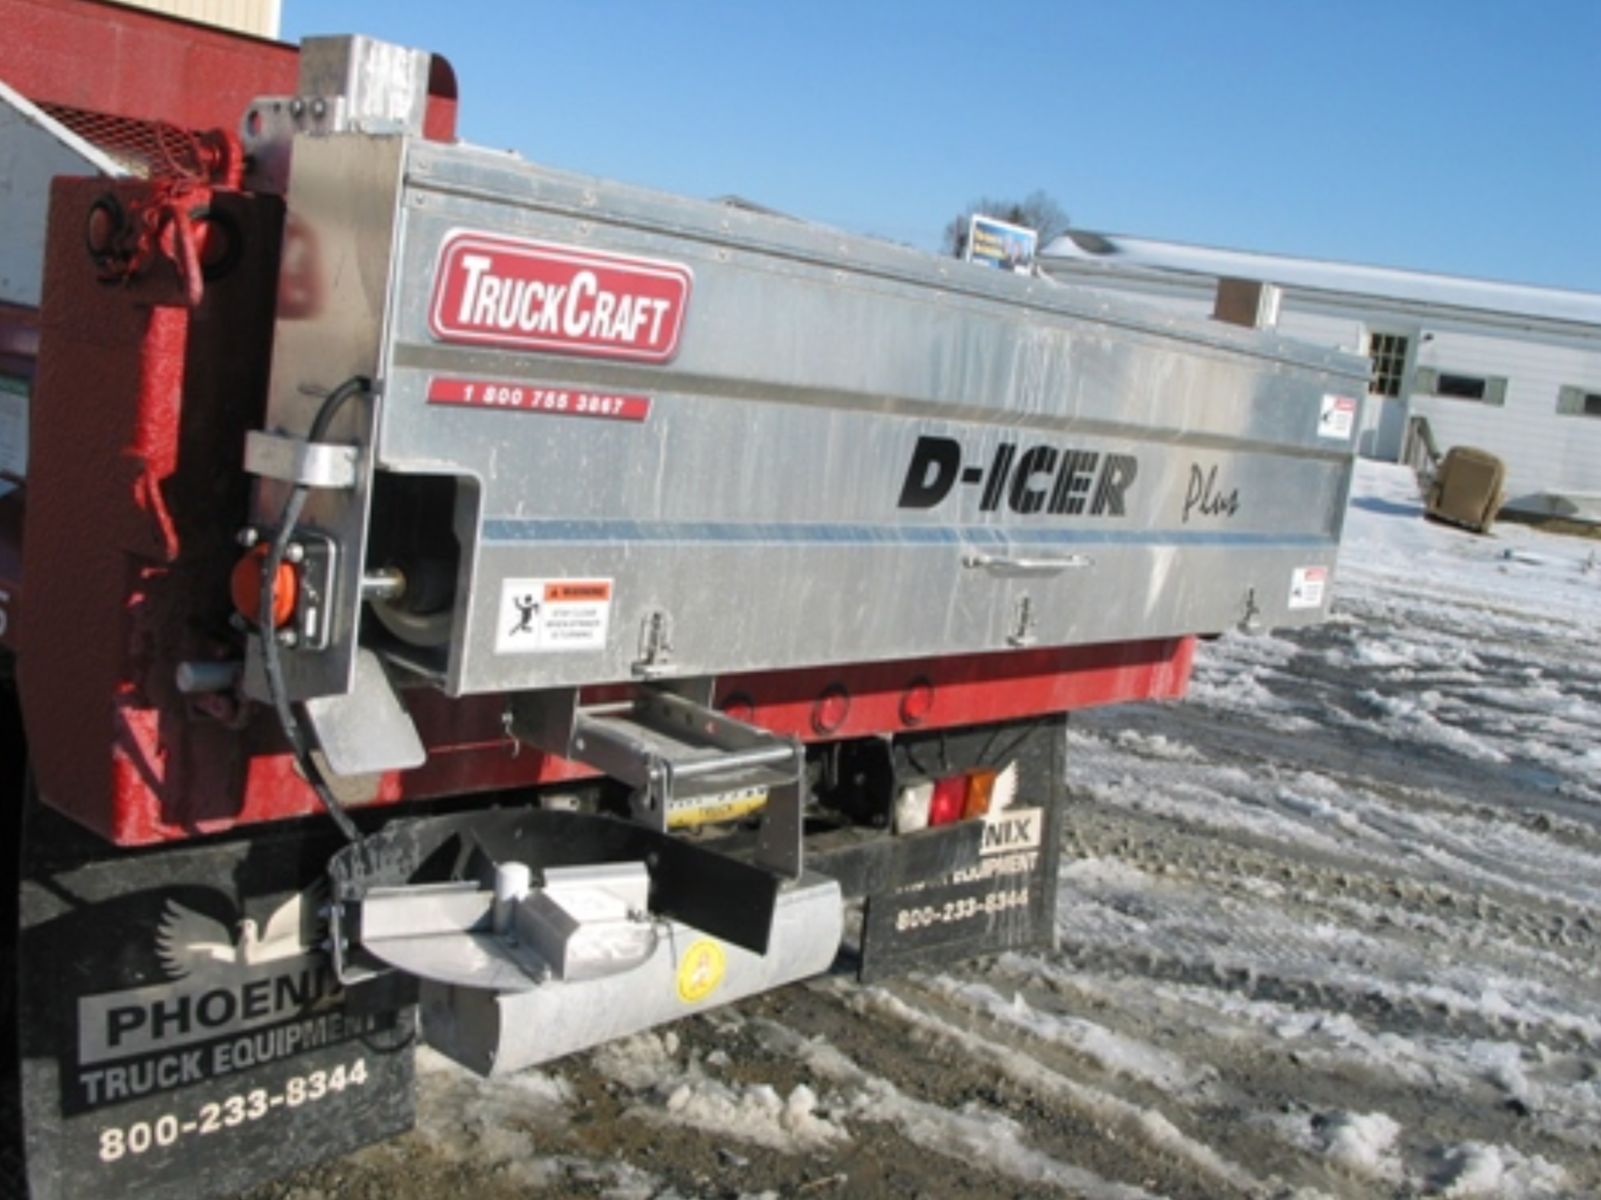 Truck Craft TC-140 PLUS D-ICER Salt Spreader